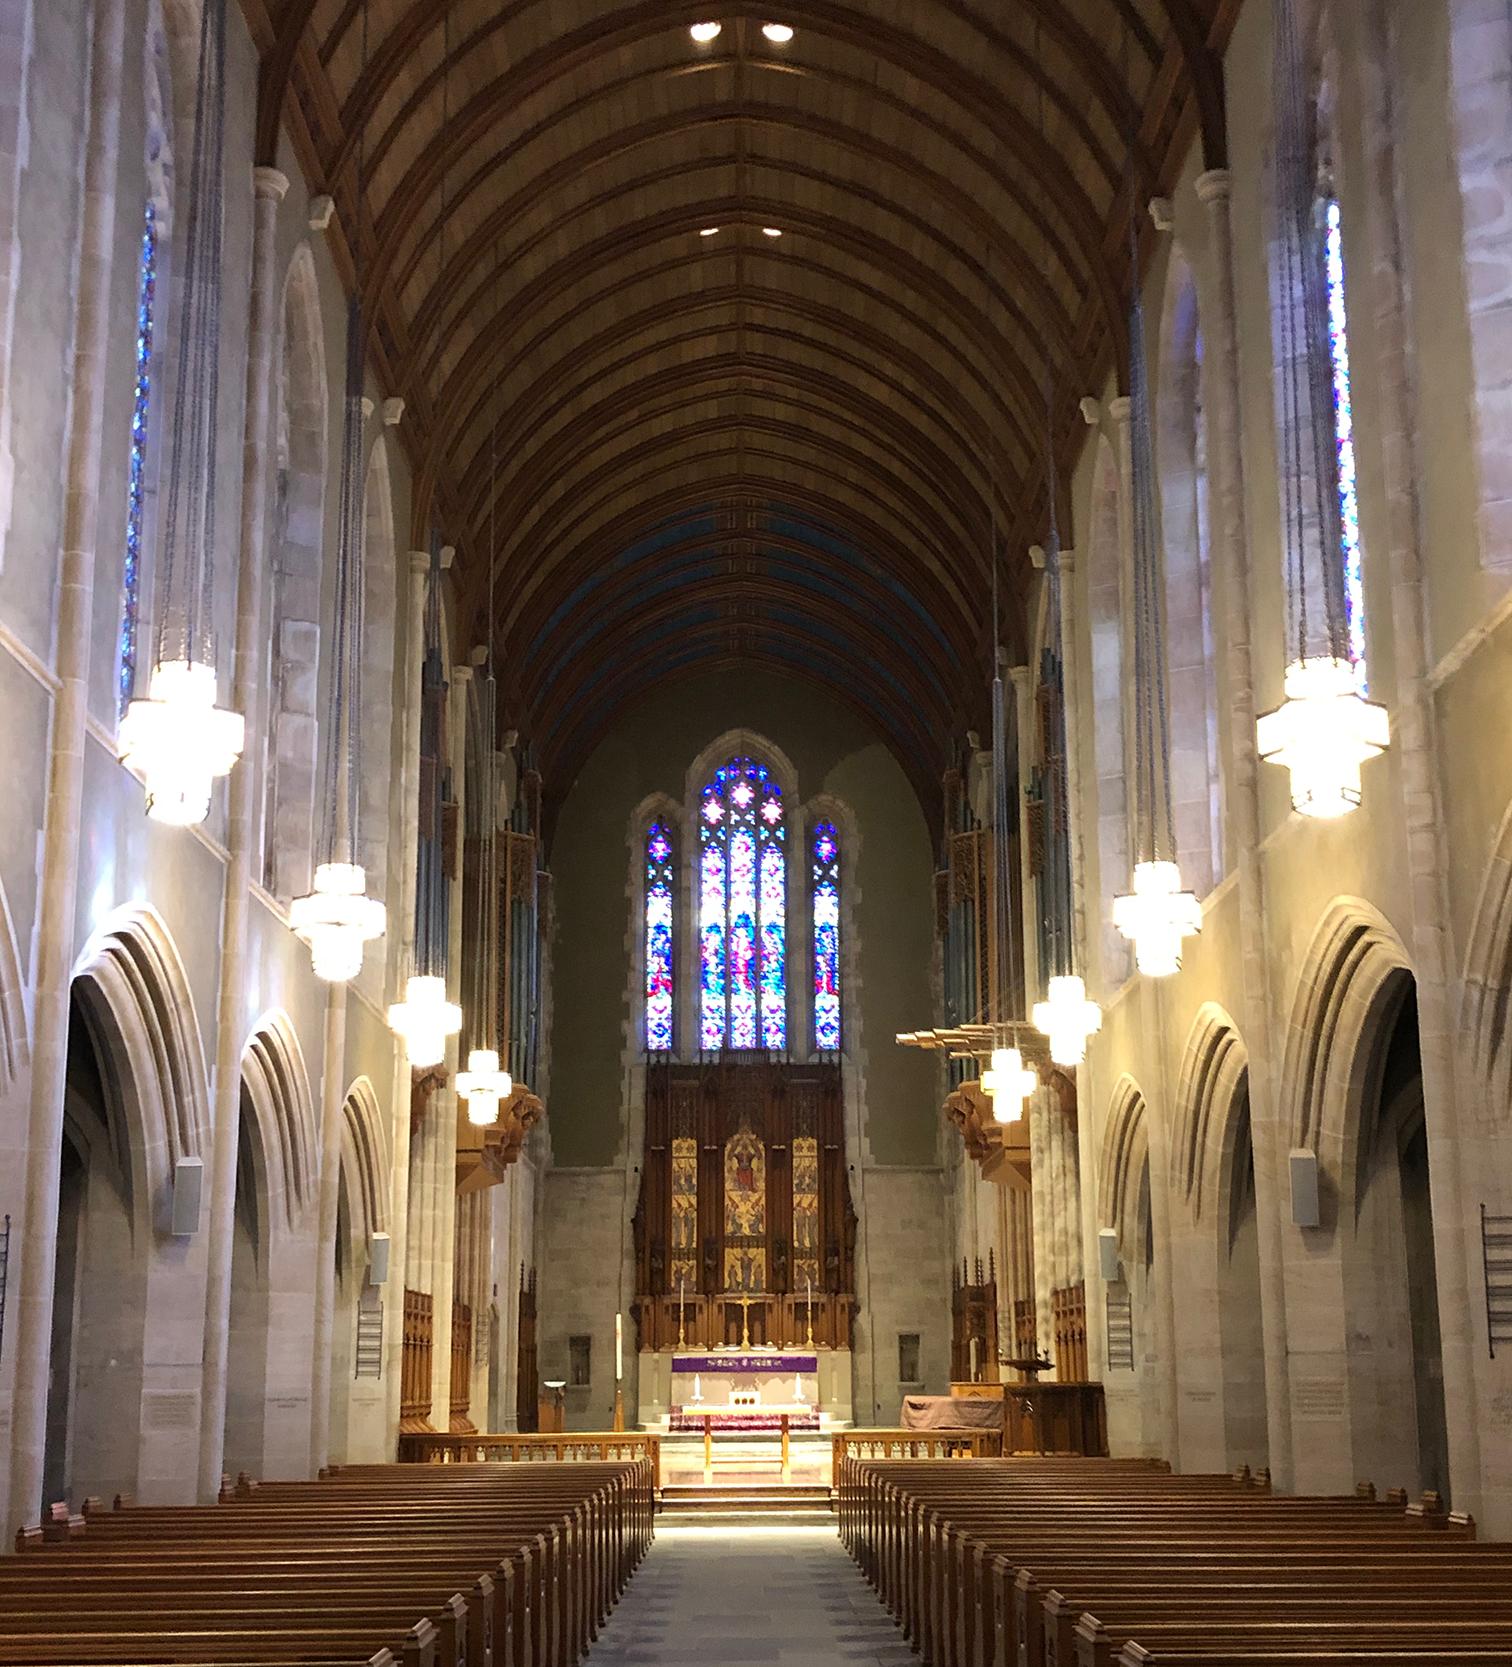 Egner Memorial Chapel